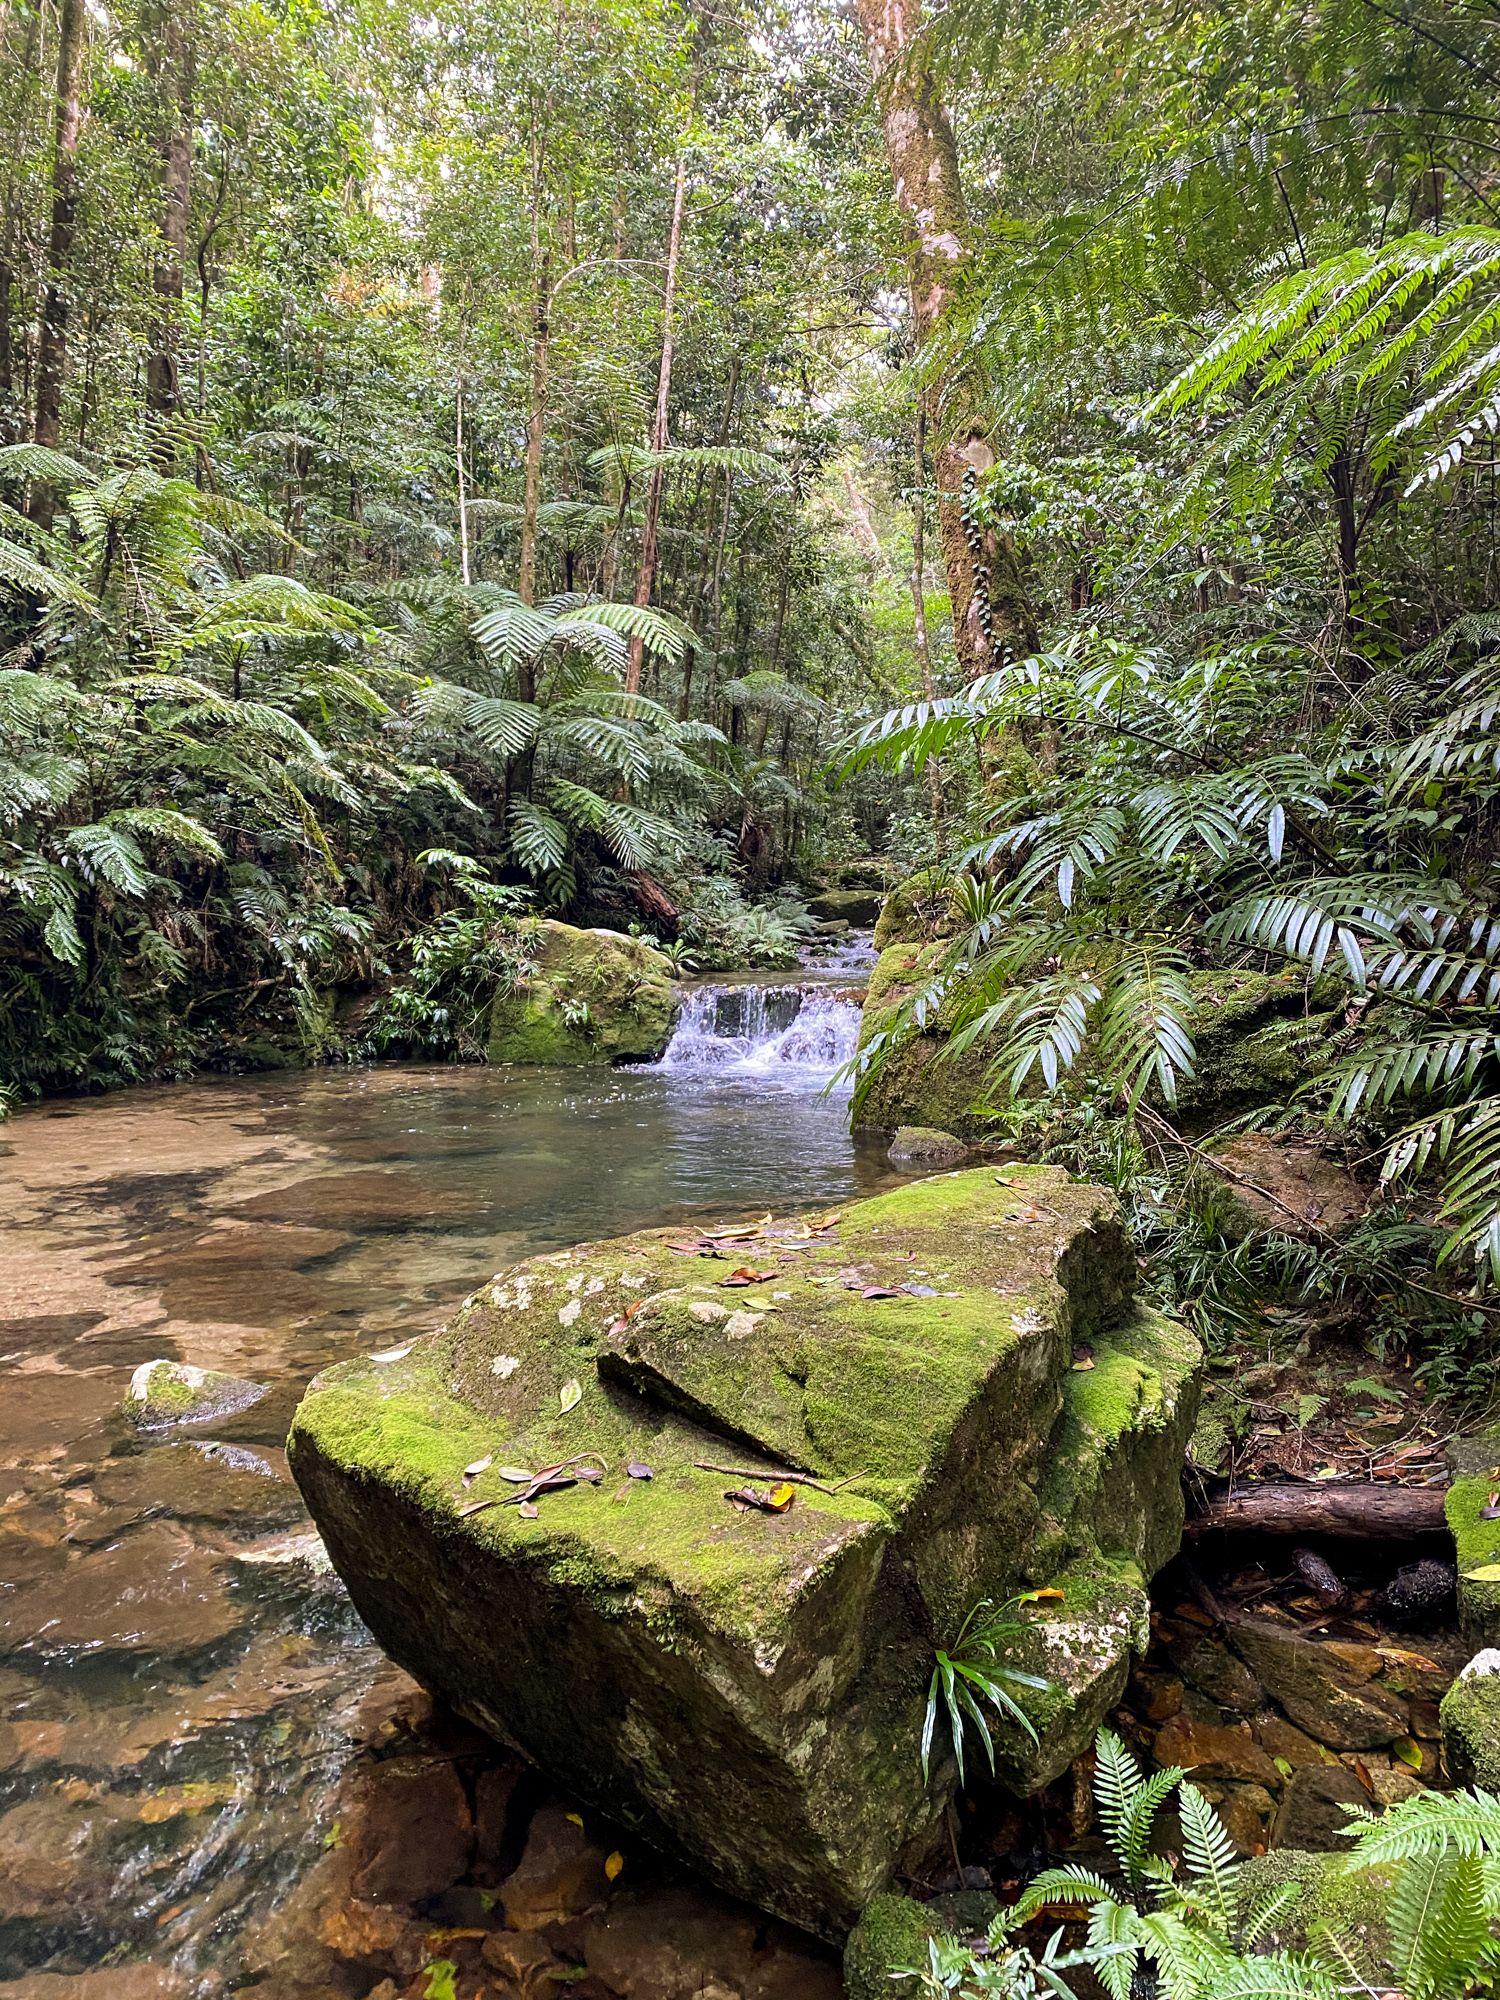 dolby creek mossy rock